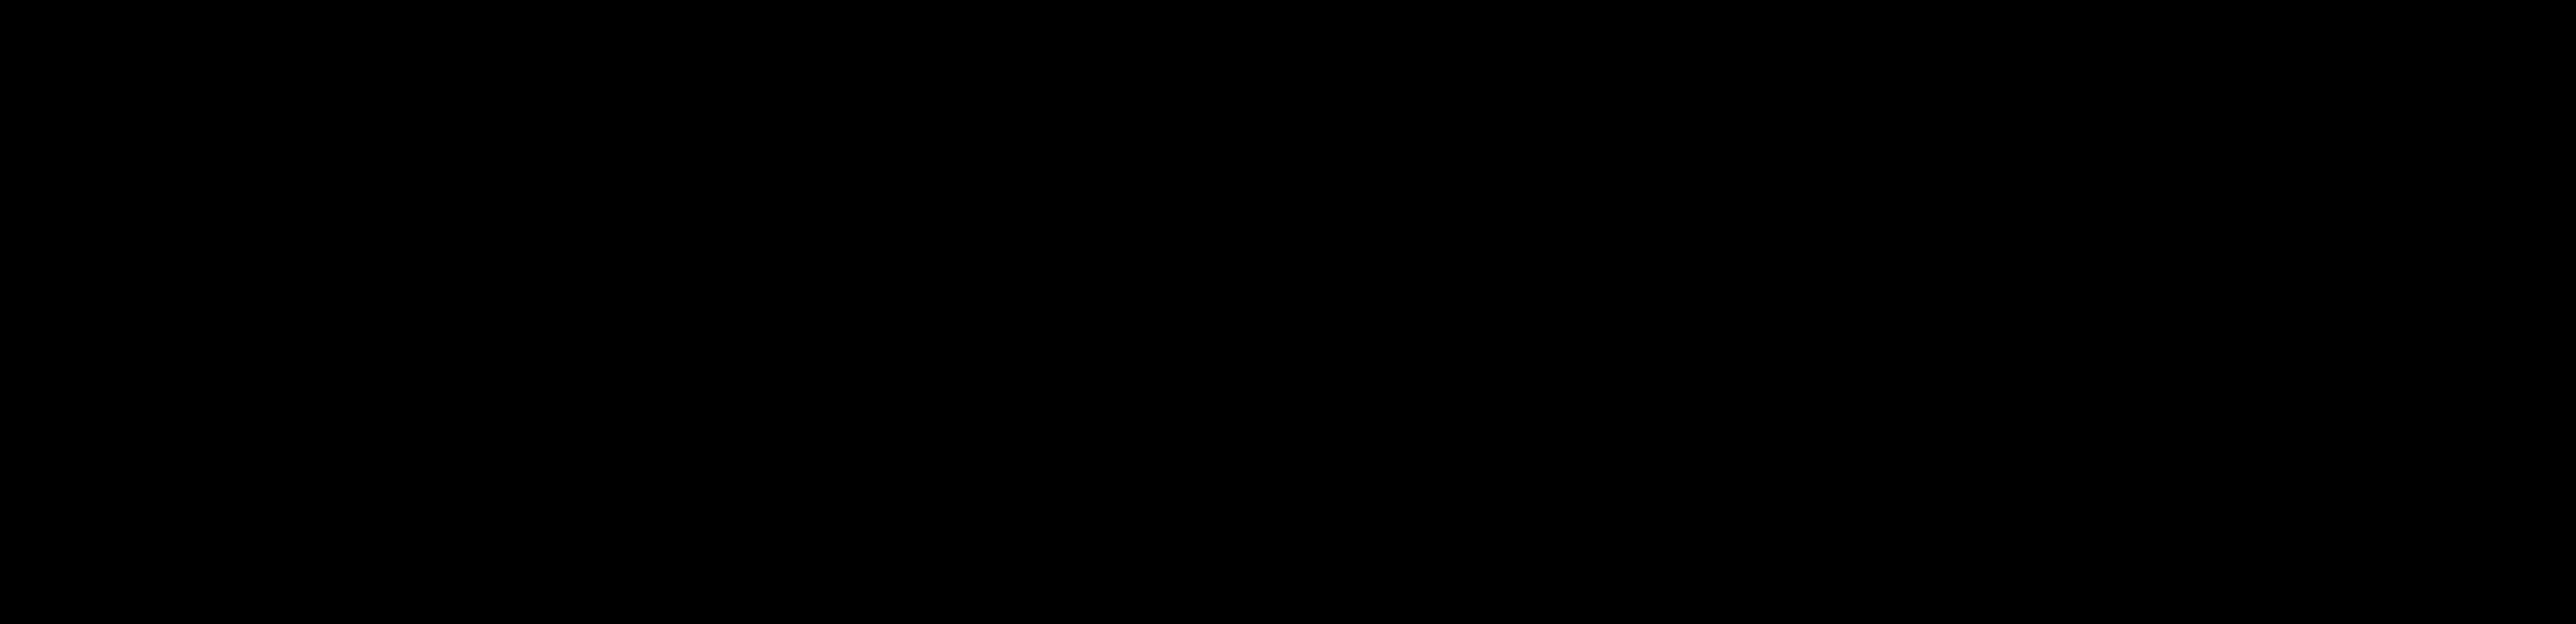 Diethyl (14-amino-3,6,9,12-tetraoxatetradecyl)phosphonate